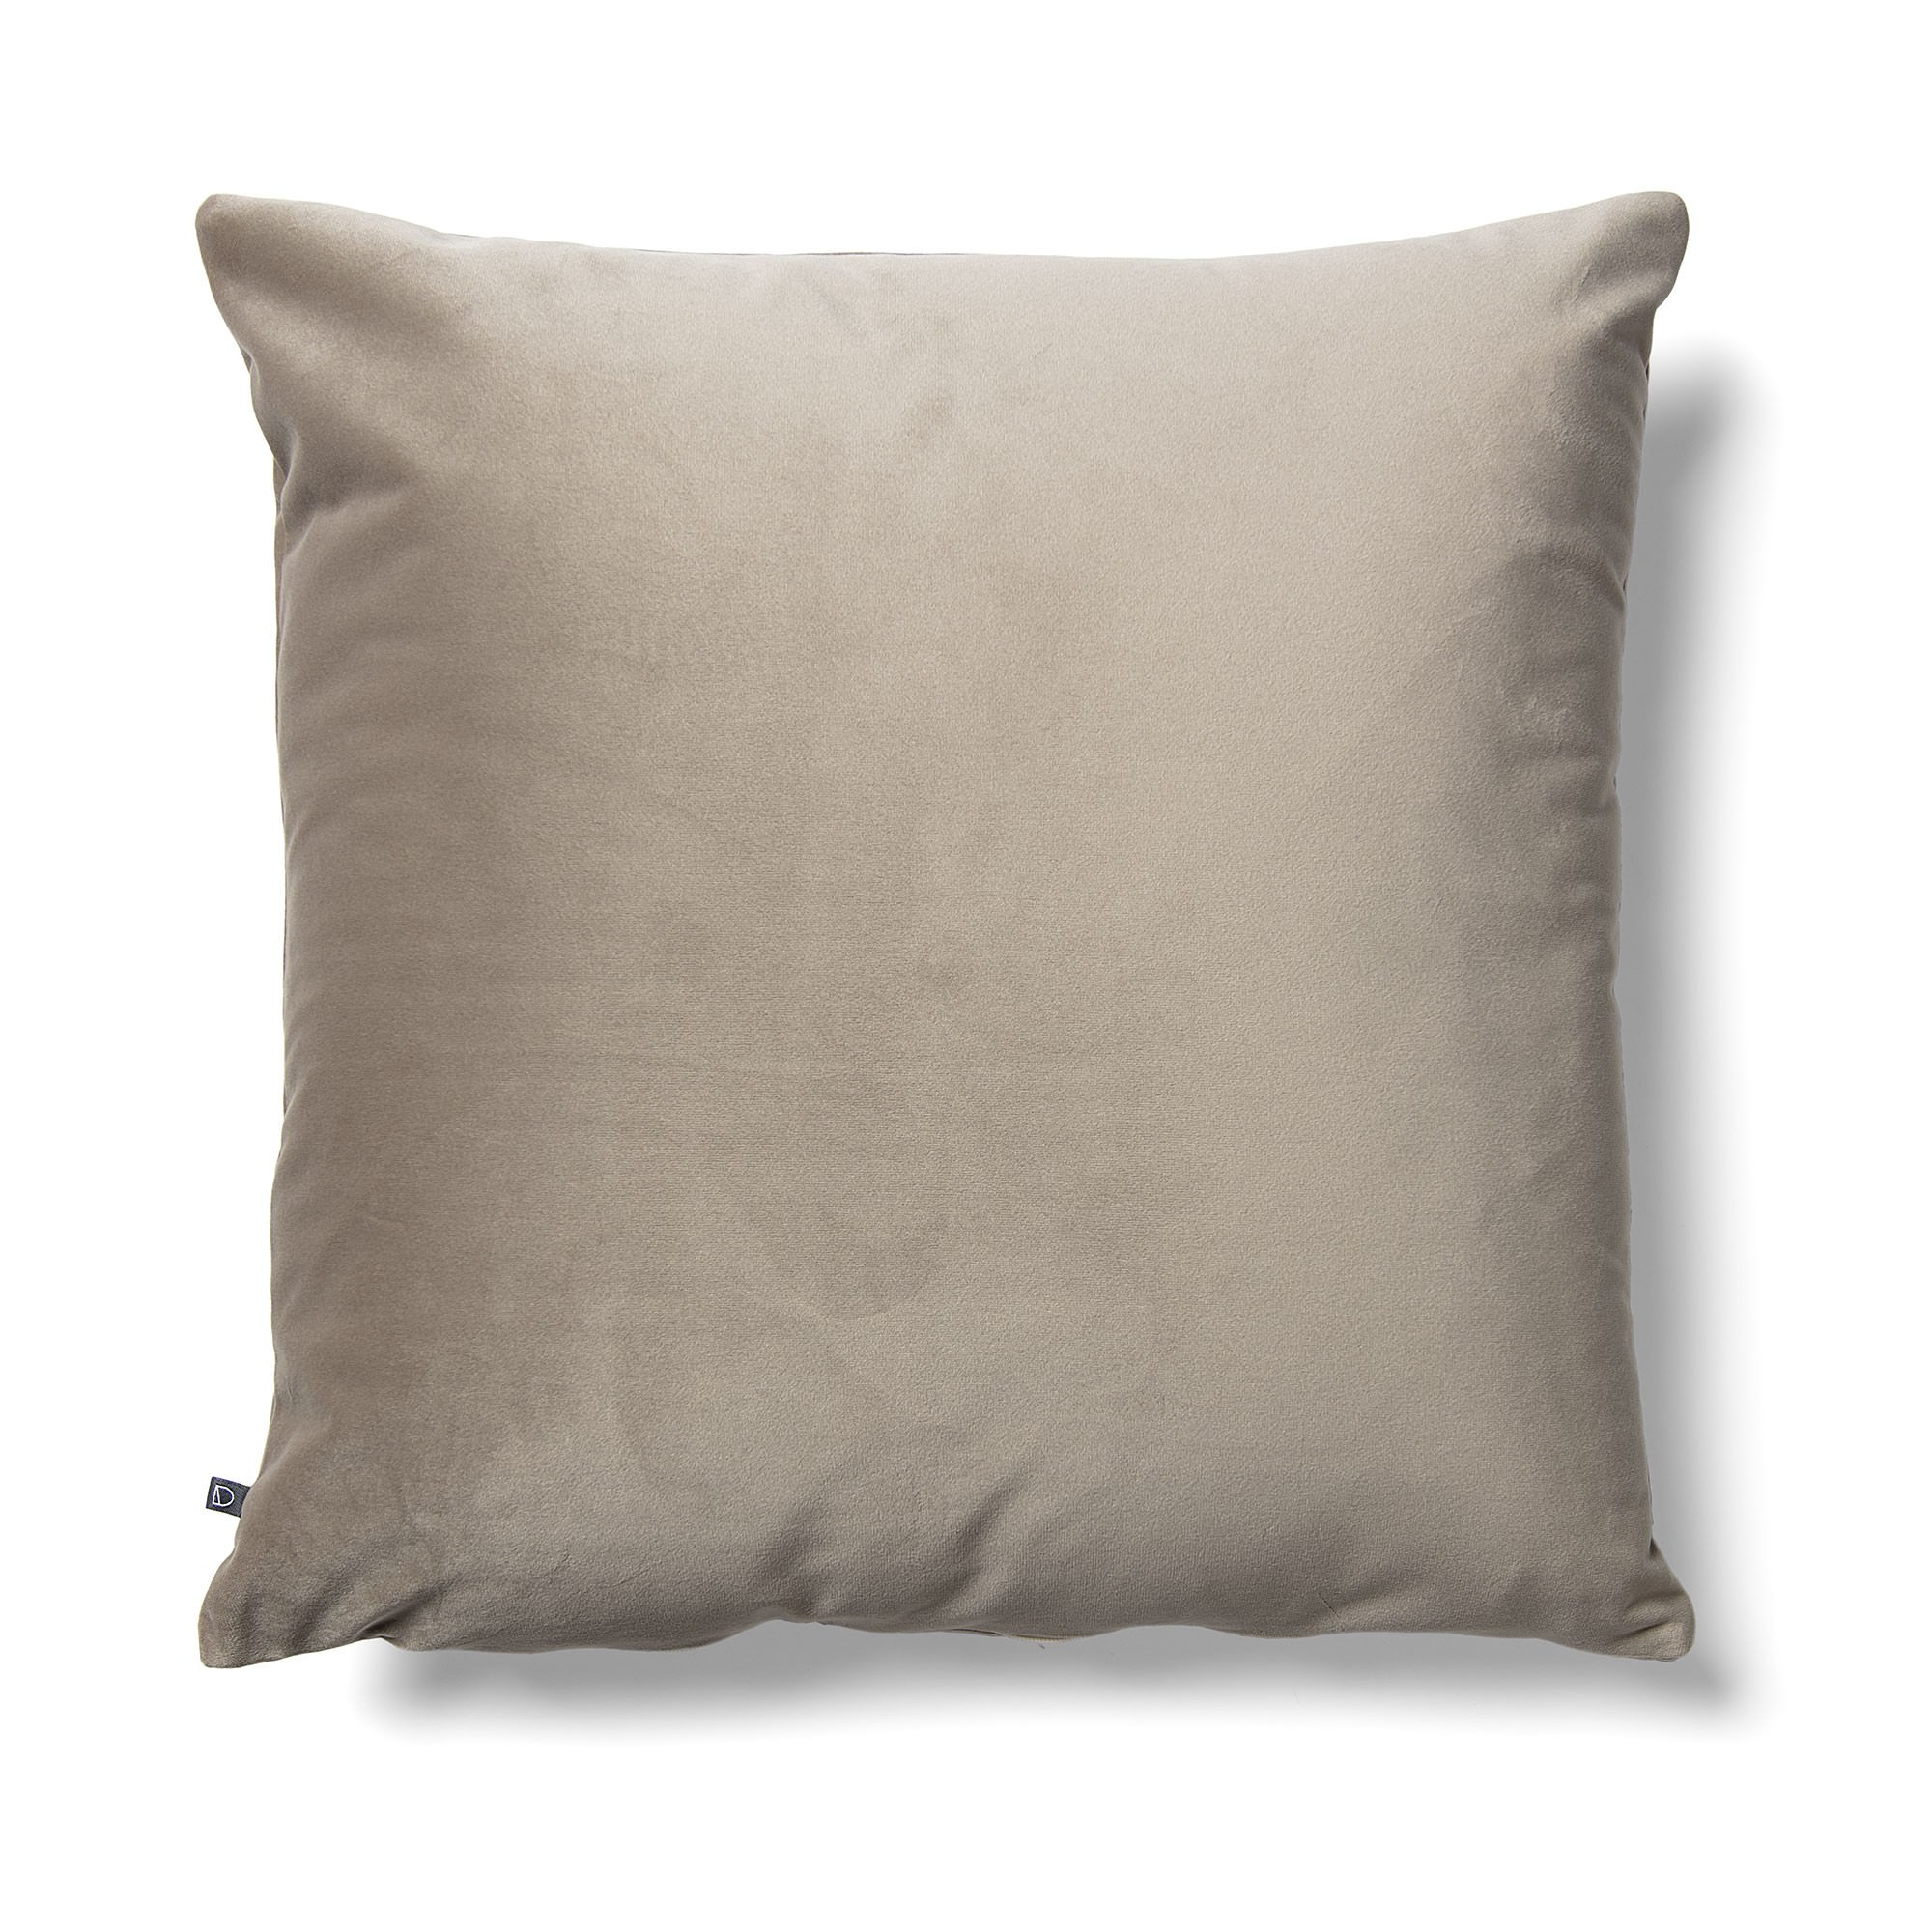 Daraya Velvet Fabric Scatter Cushion, Taupe